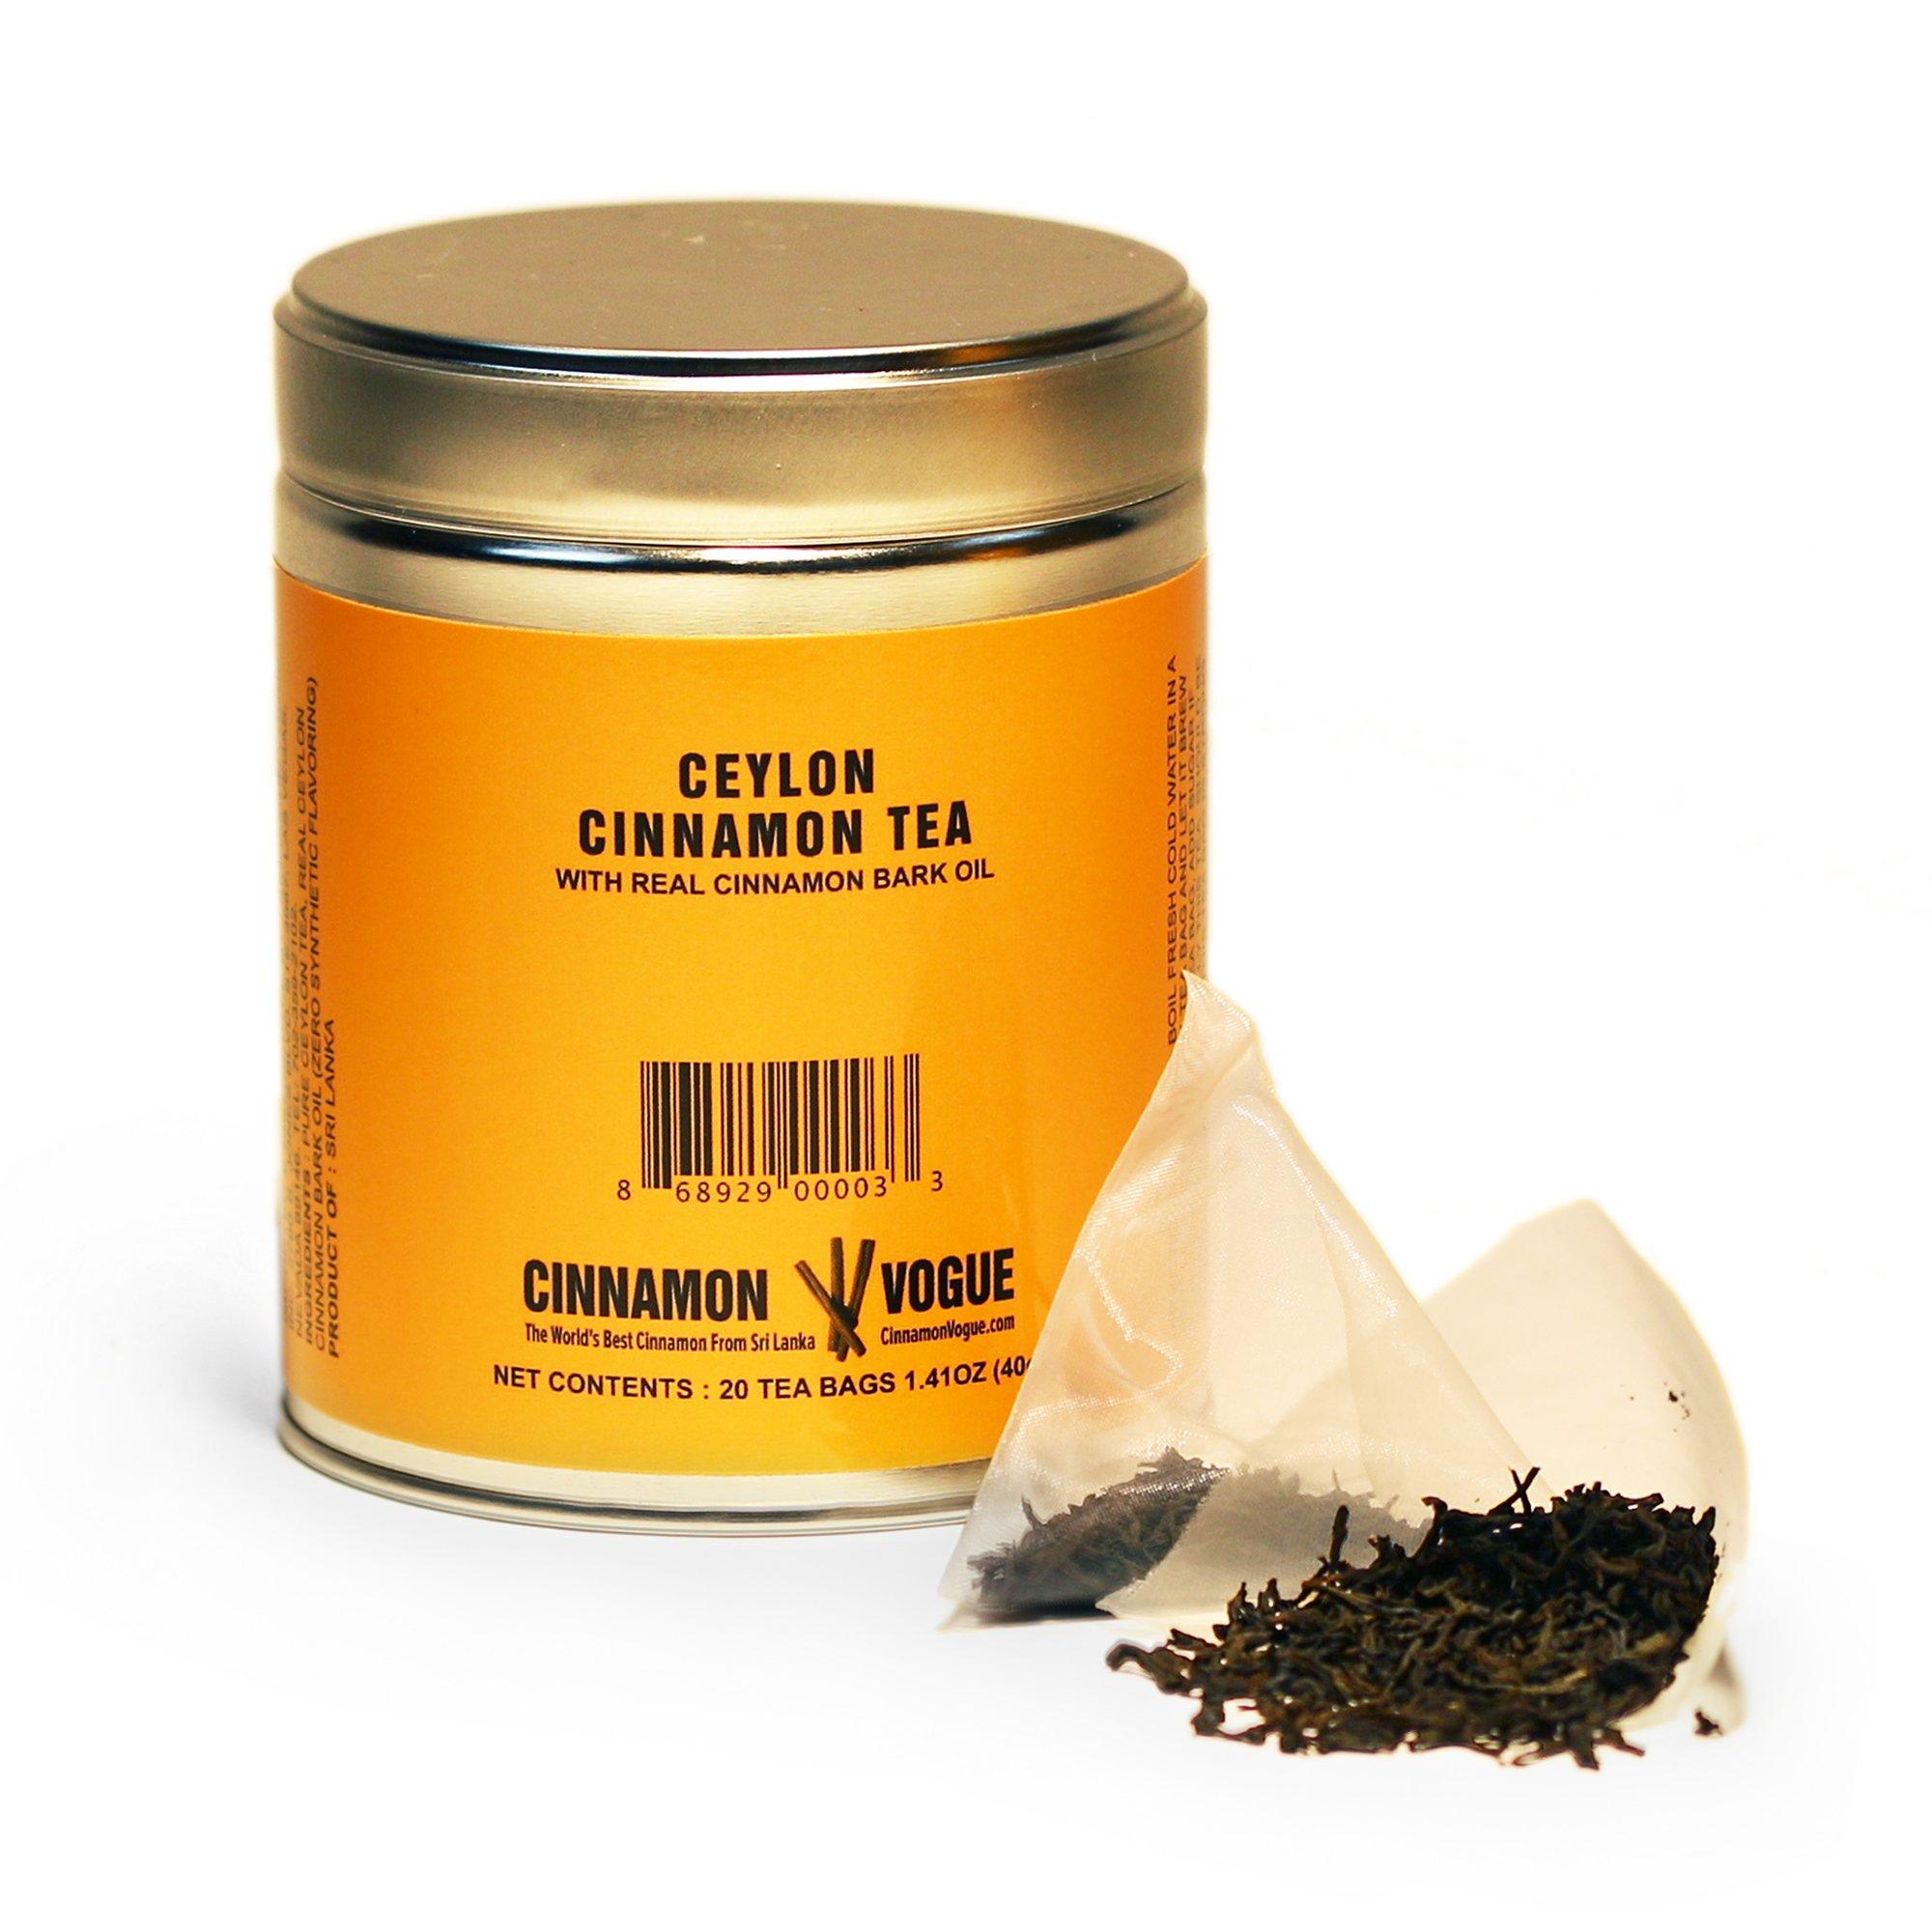 Cinnamon Tea Premium Ceylon Flavoring